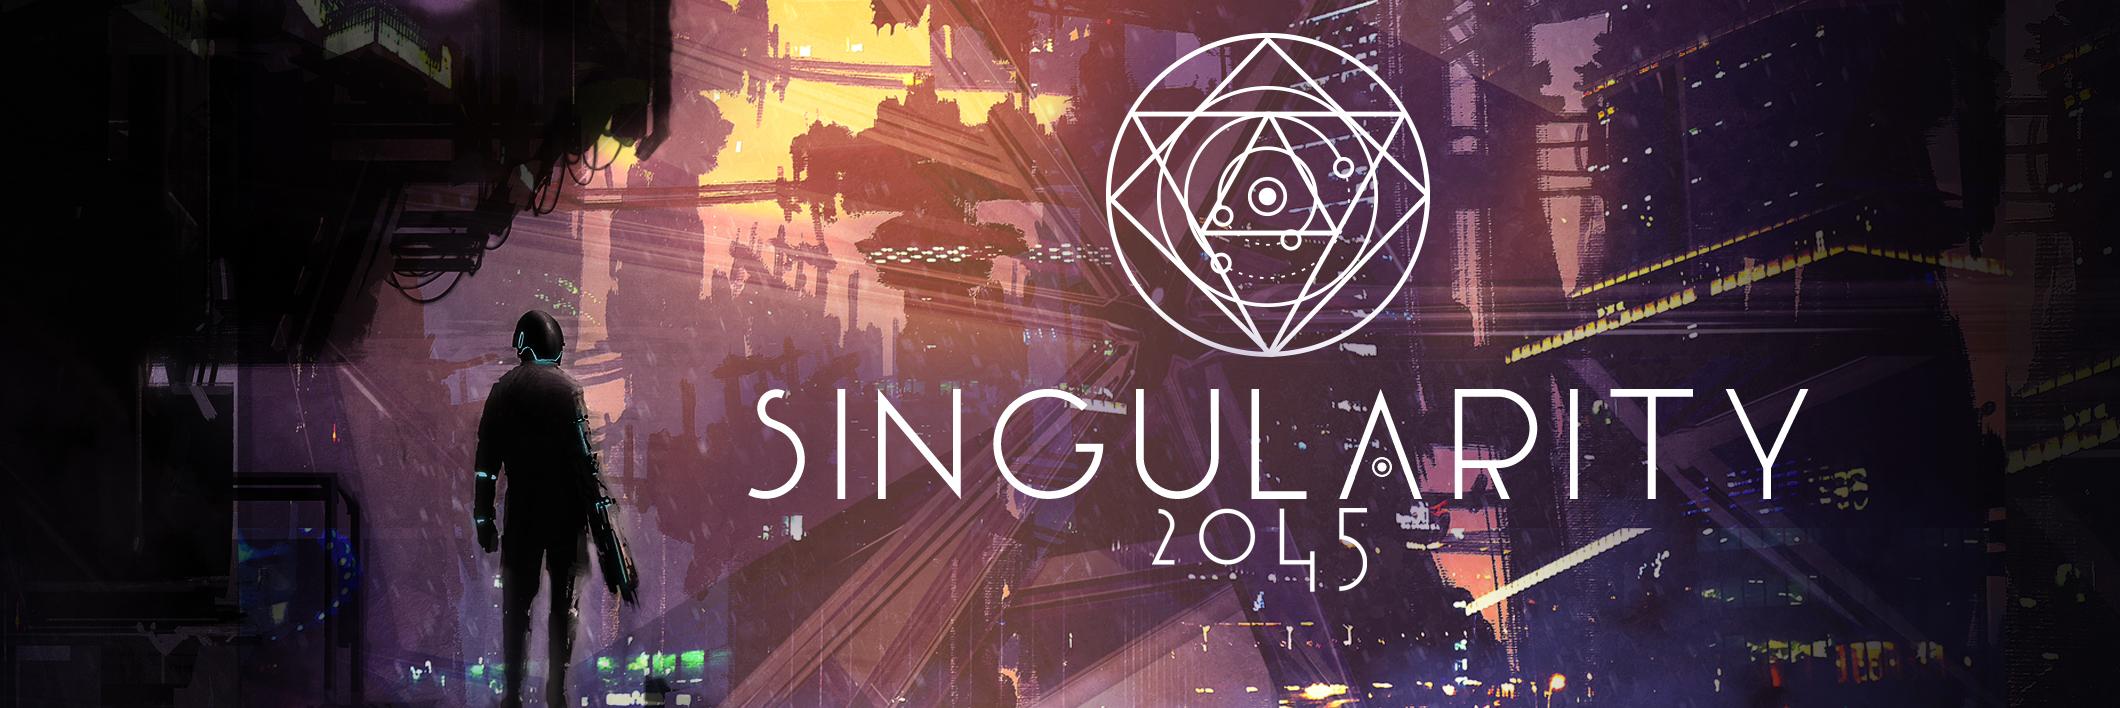 Ver Singularity 2045